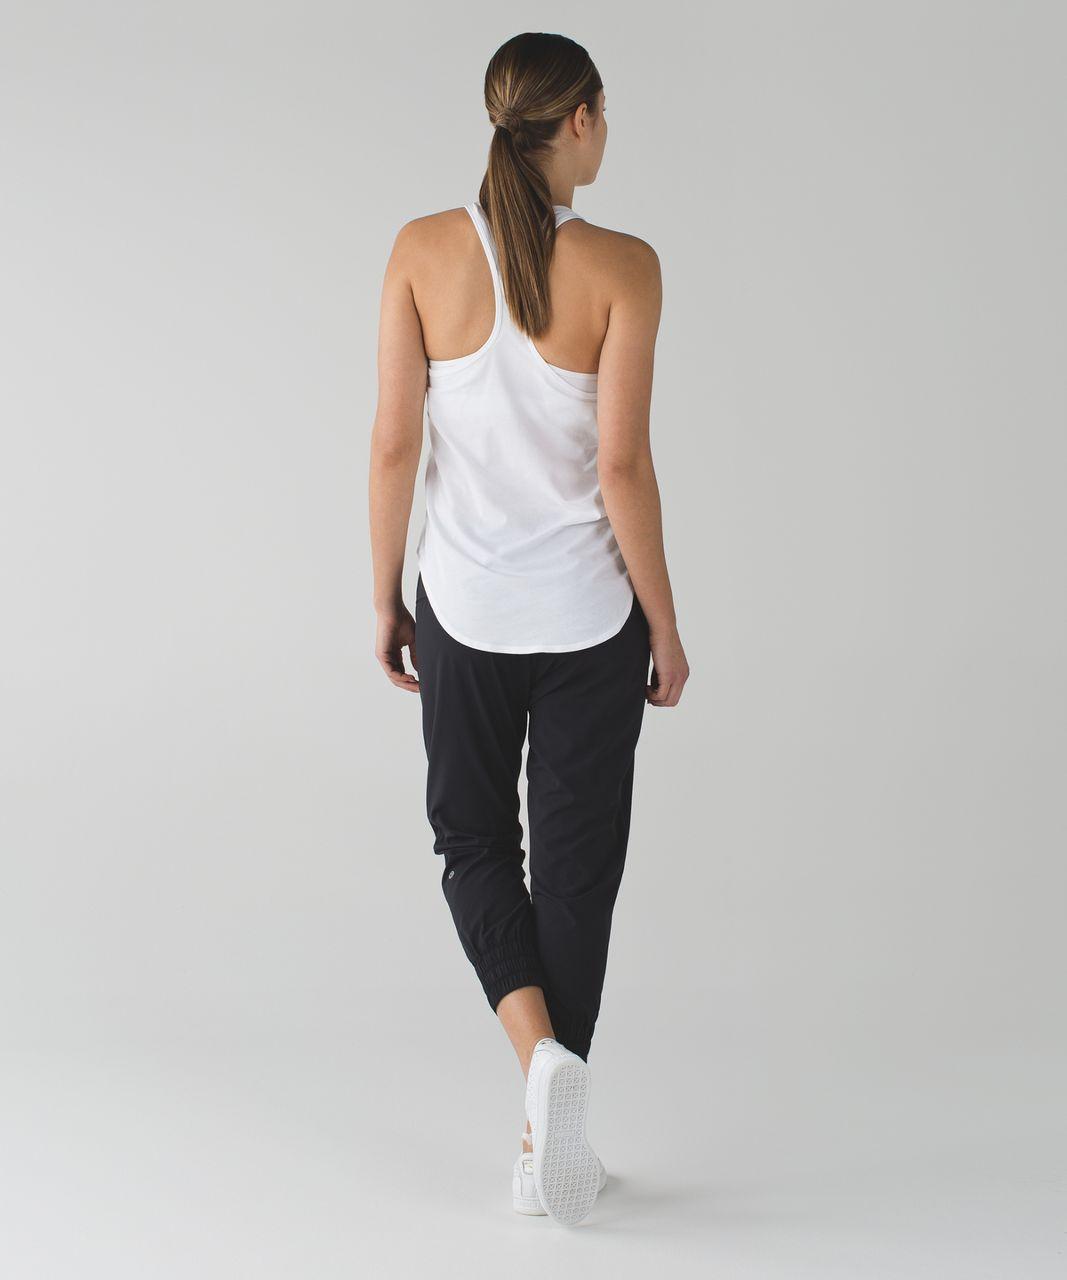 Lululemon Stretch It Out Crop - Black